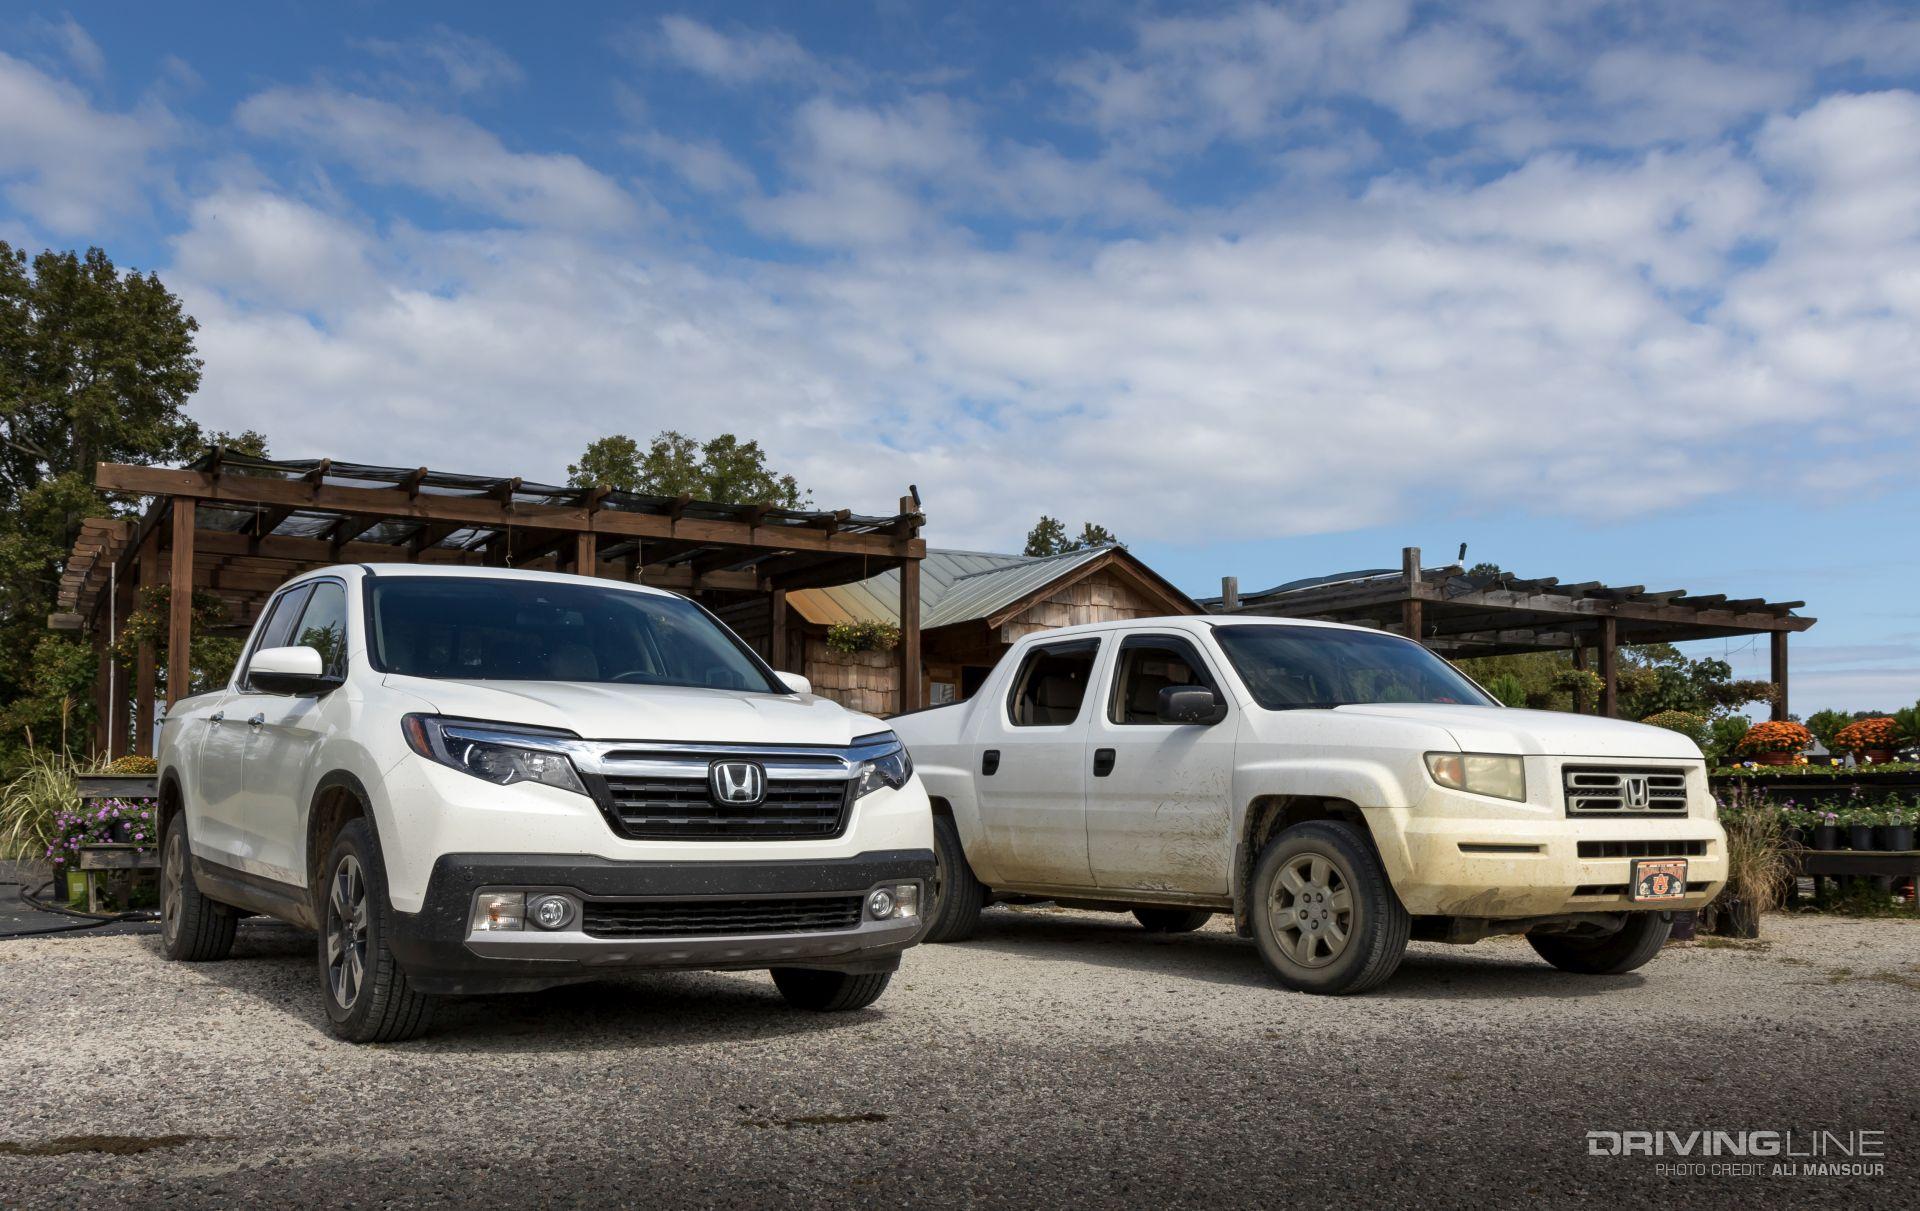 Honda Ridgeline Off Road >> Truck Enough The 2018 Honda Ridgeline Review Drivingline